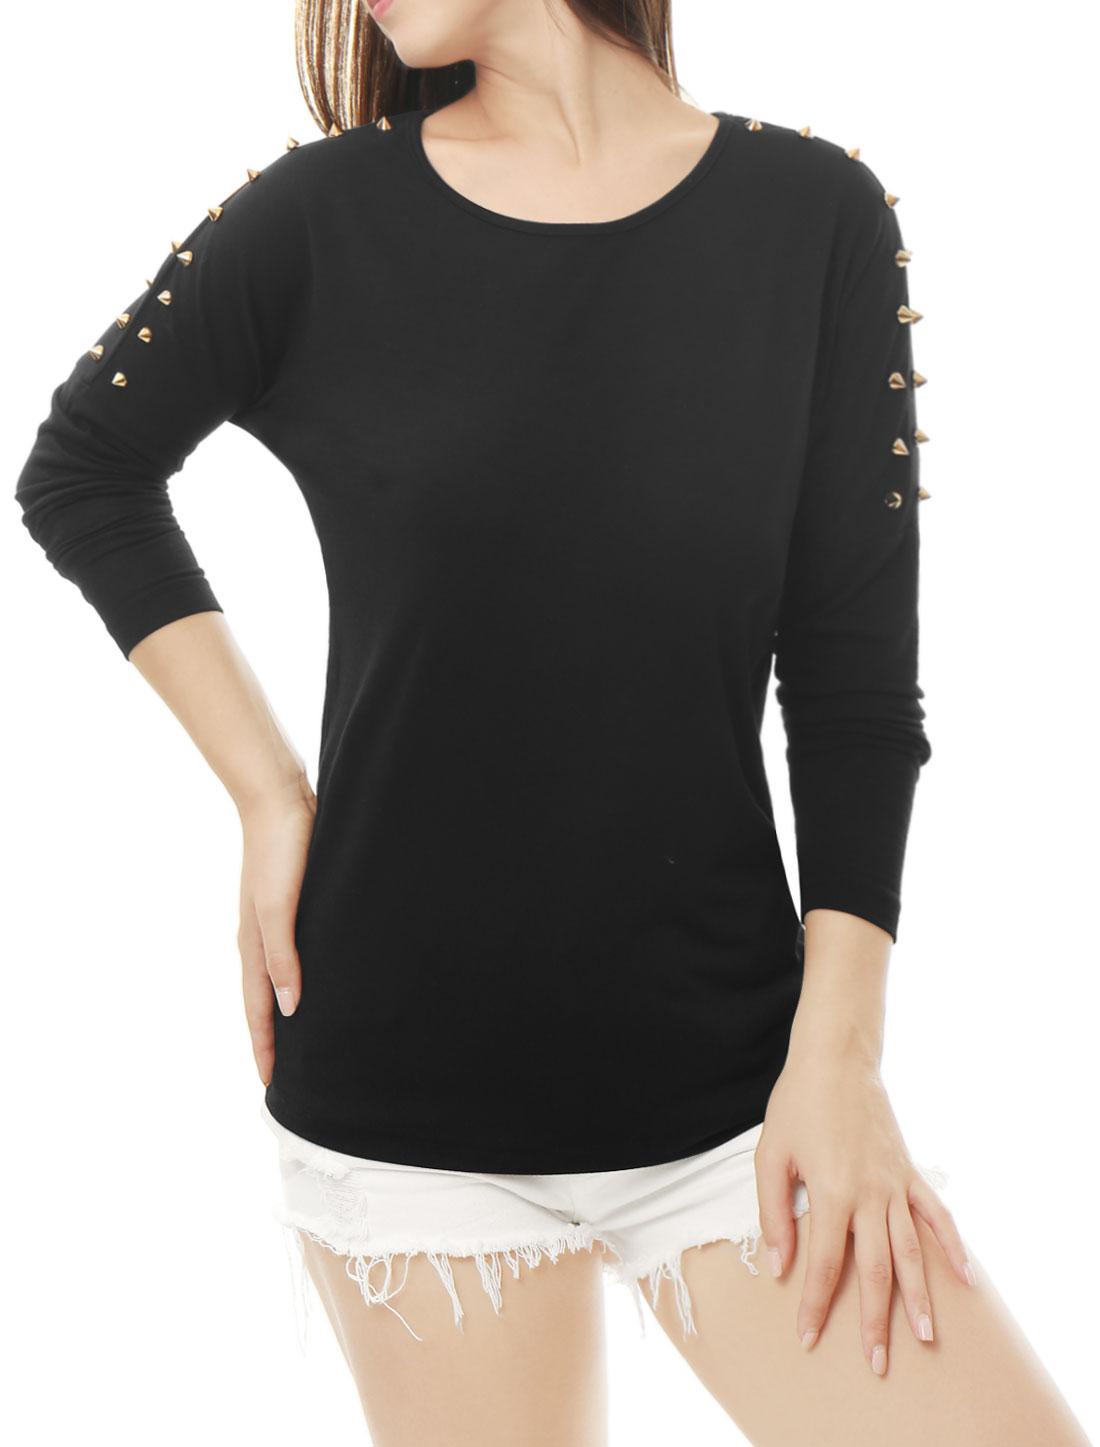 Women Round Neck Studs Embellished Dolman Sleeves Top Black L